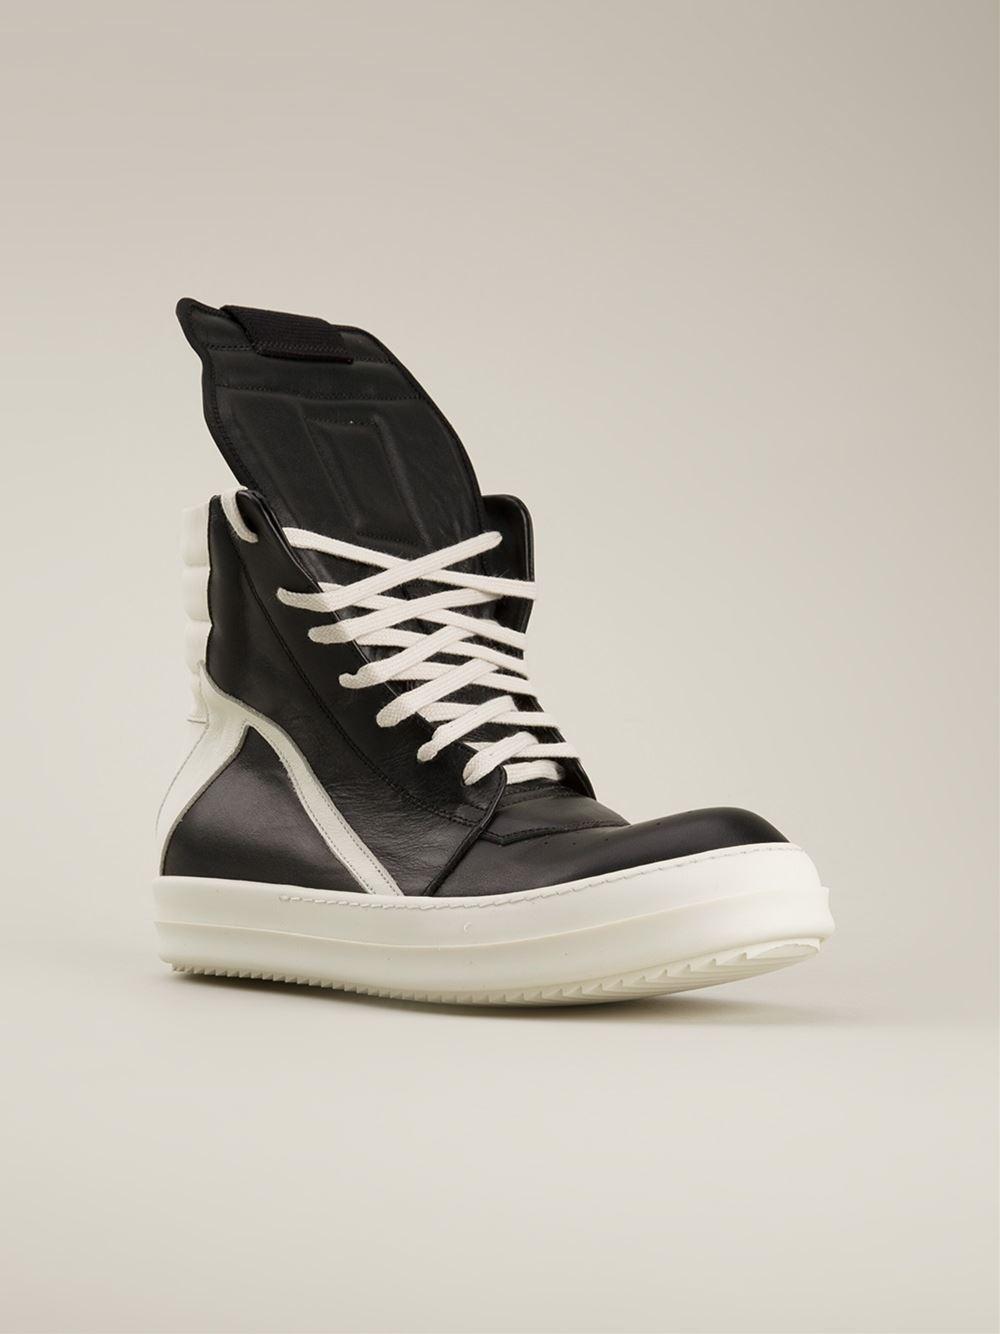 rick owens geobasket high top sneakers in black for men lyst. Black Bedroom Furniture Sets. Home Design Ideas